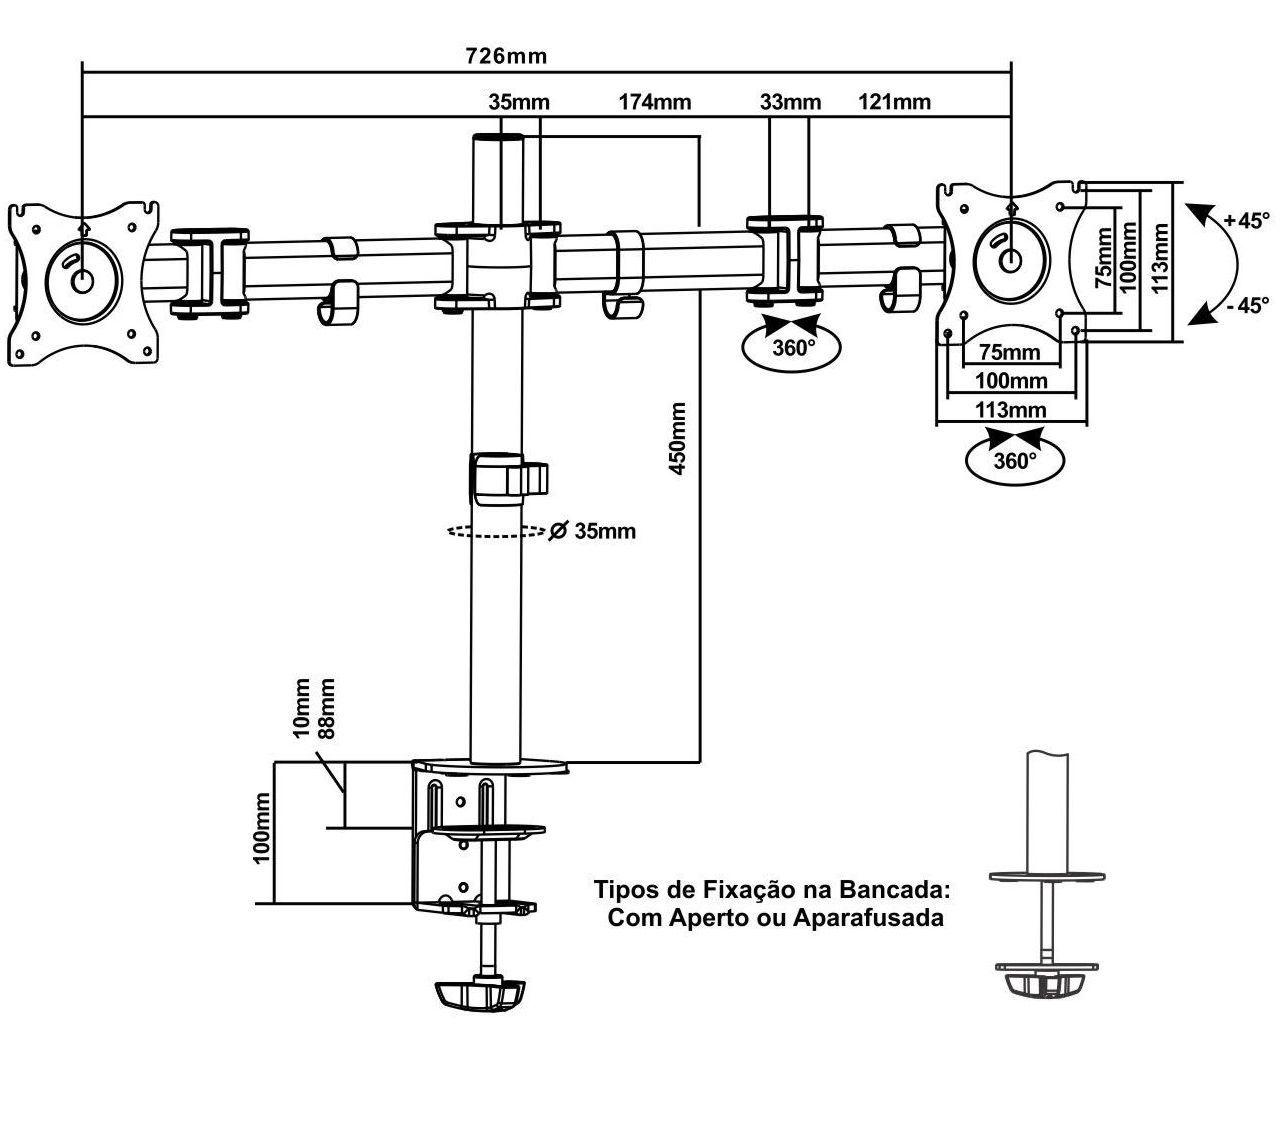 "Suporte Articulado Mesa Para 2 Monitores De 13 "" A 27 "" FT-726m2 - FIXATEK"